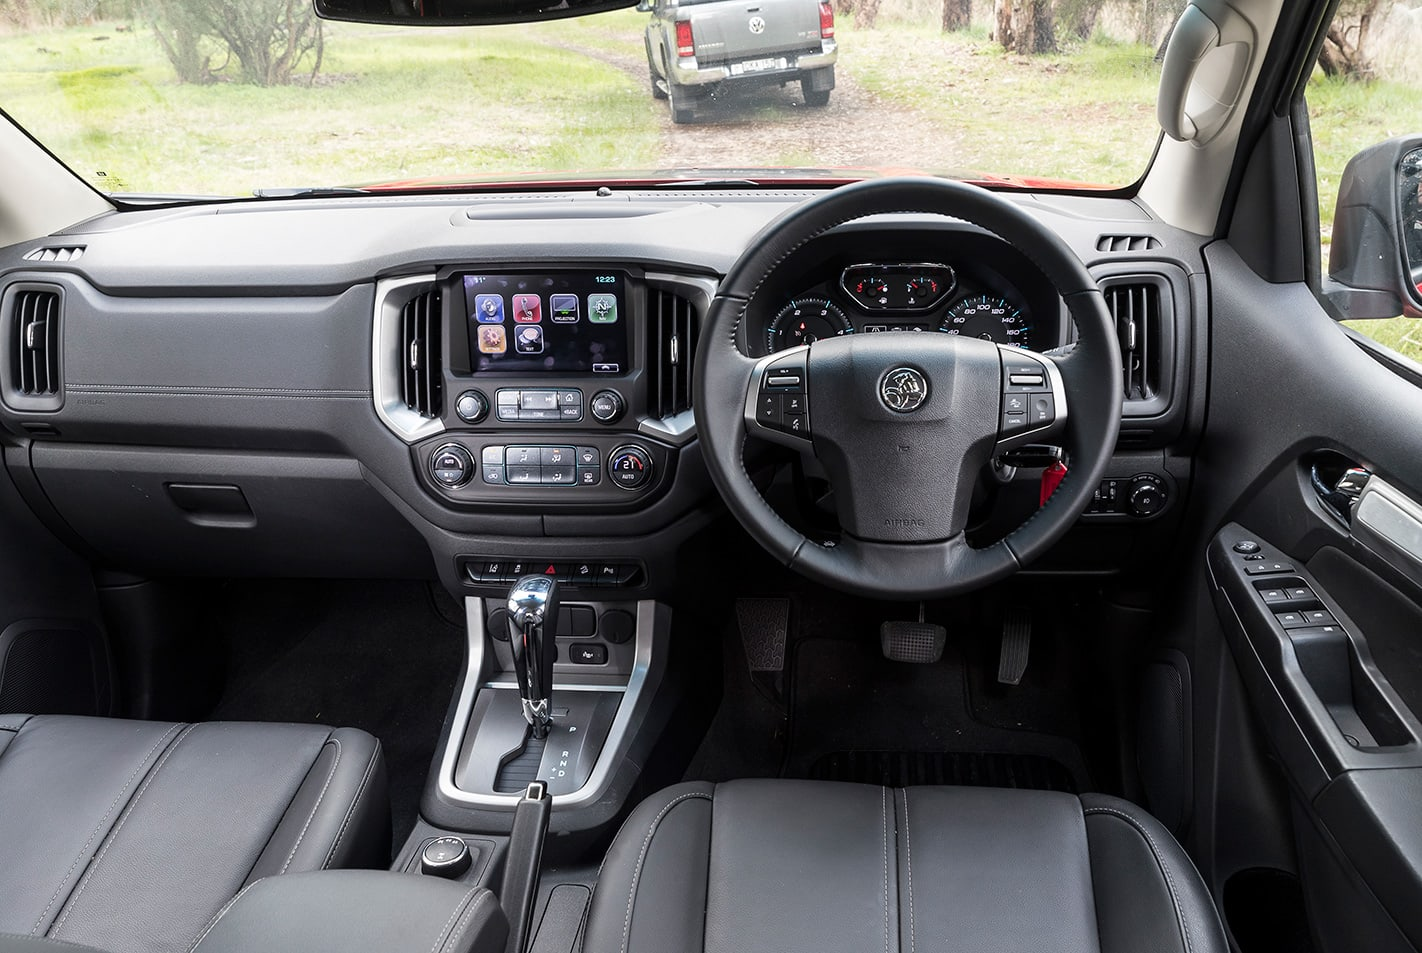 Holden Colorado Z71 interior.jpg